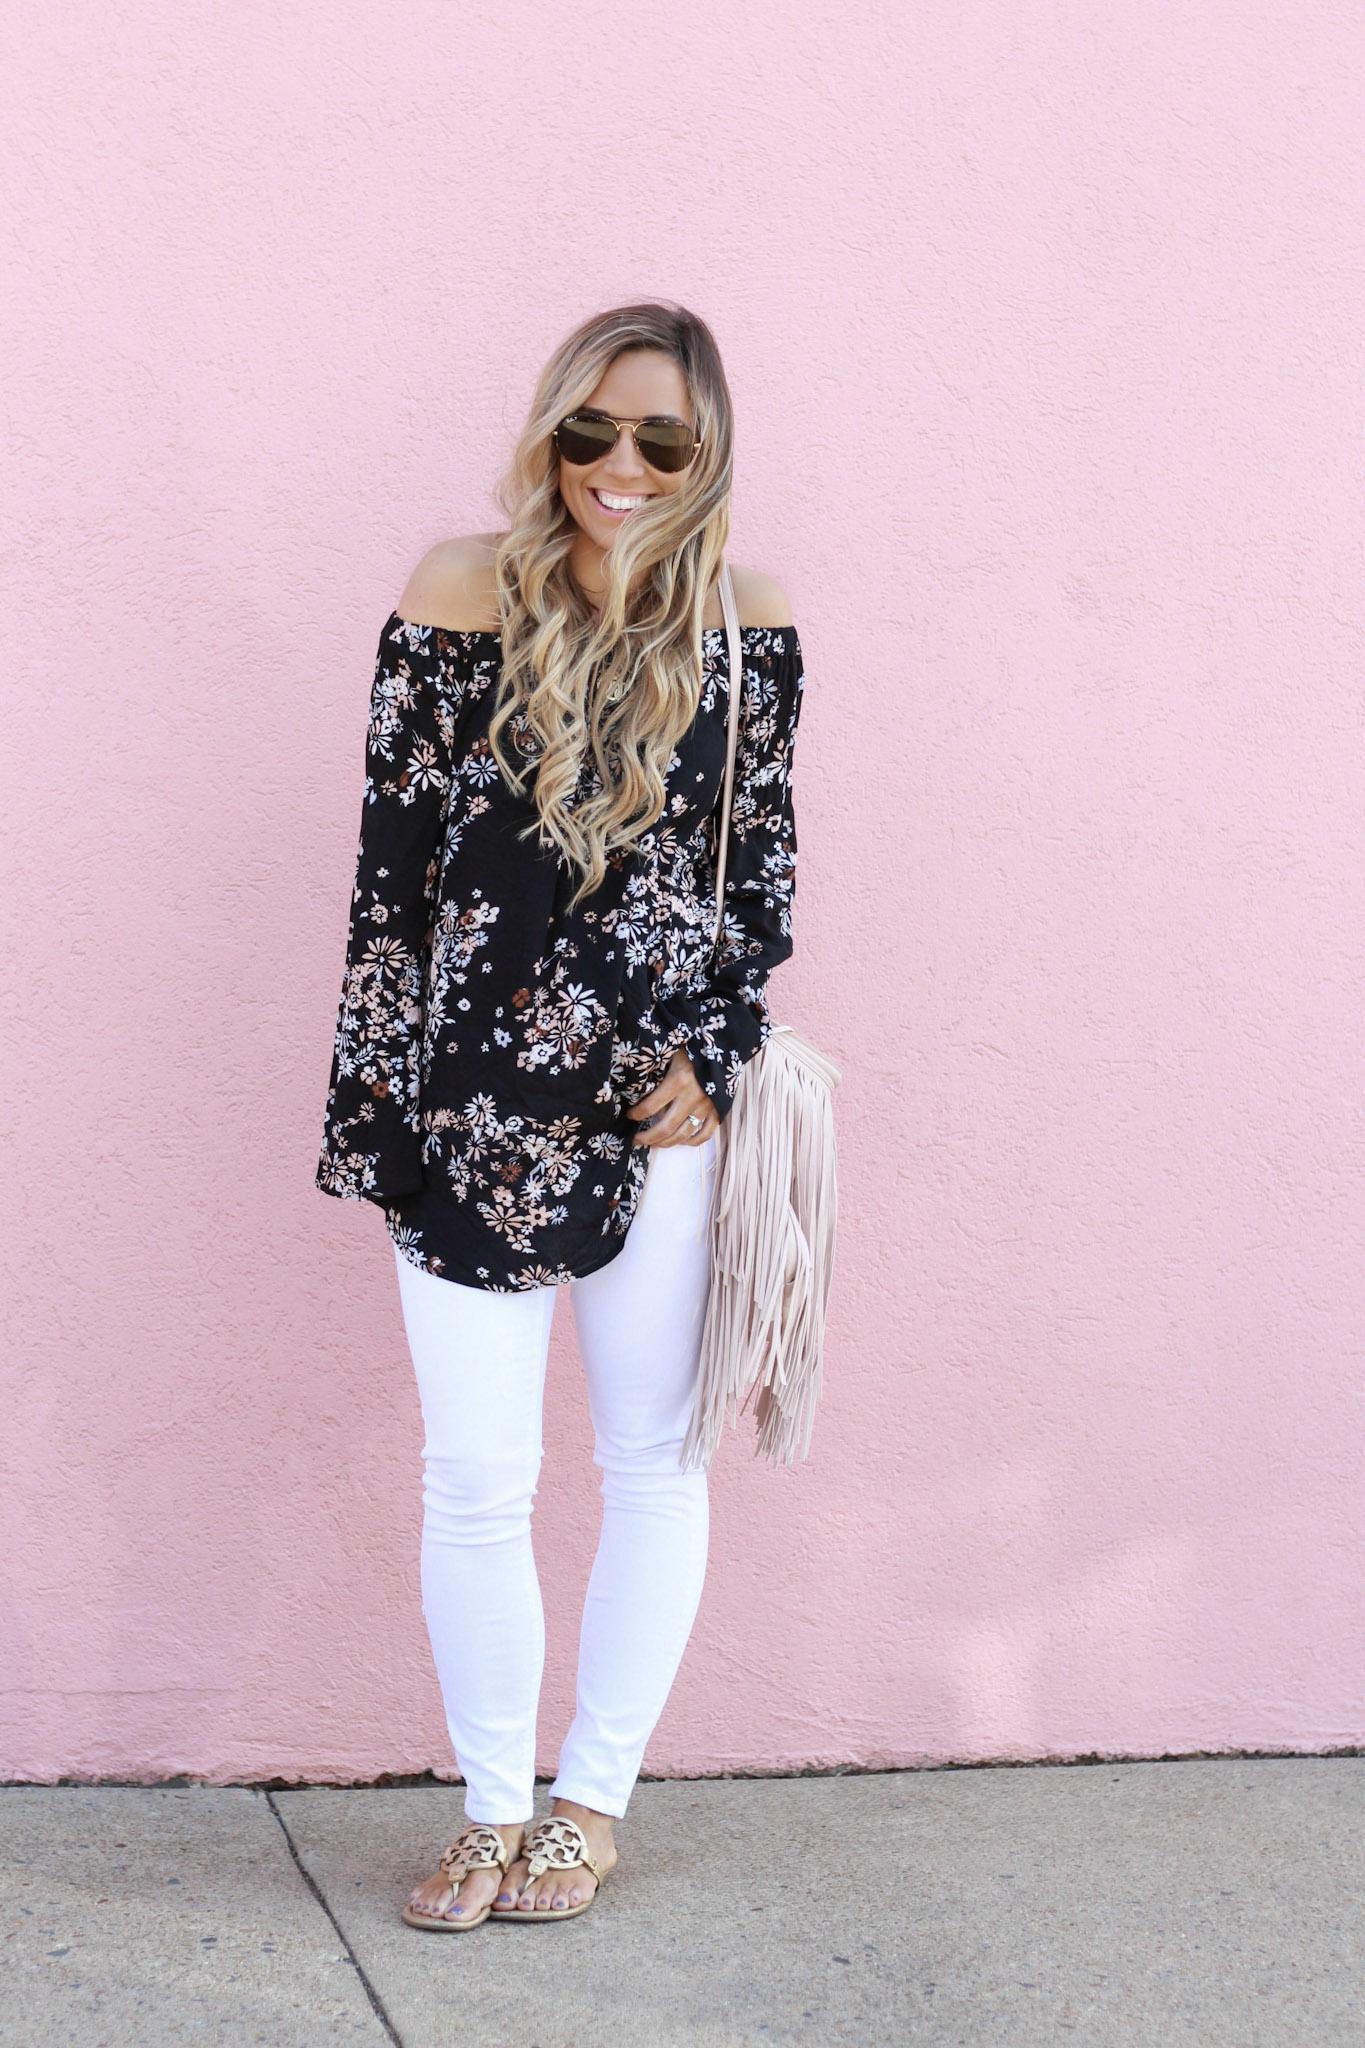 accordingtoblaire, according to blaire, floral ots top, nordstrom, fashion blogger, rva blogger, fringe bag, white skinny jeans, maternity jeans